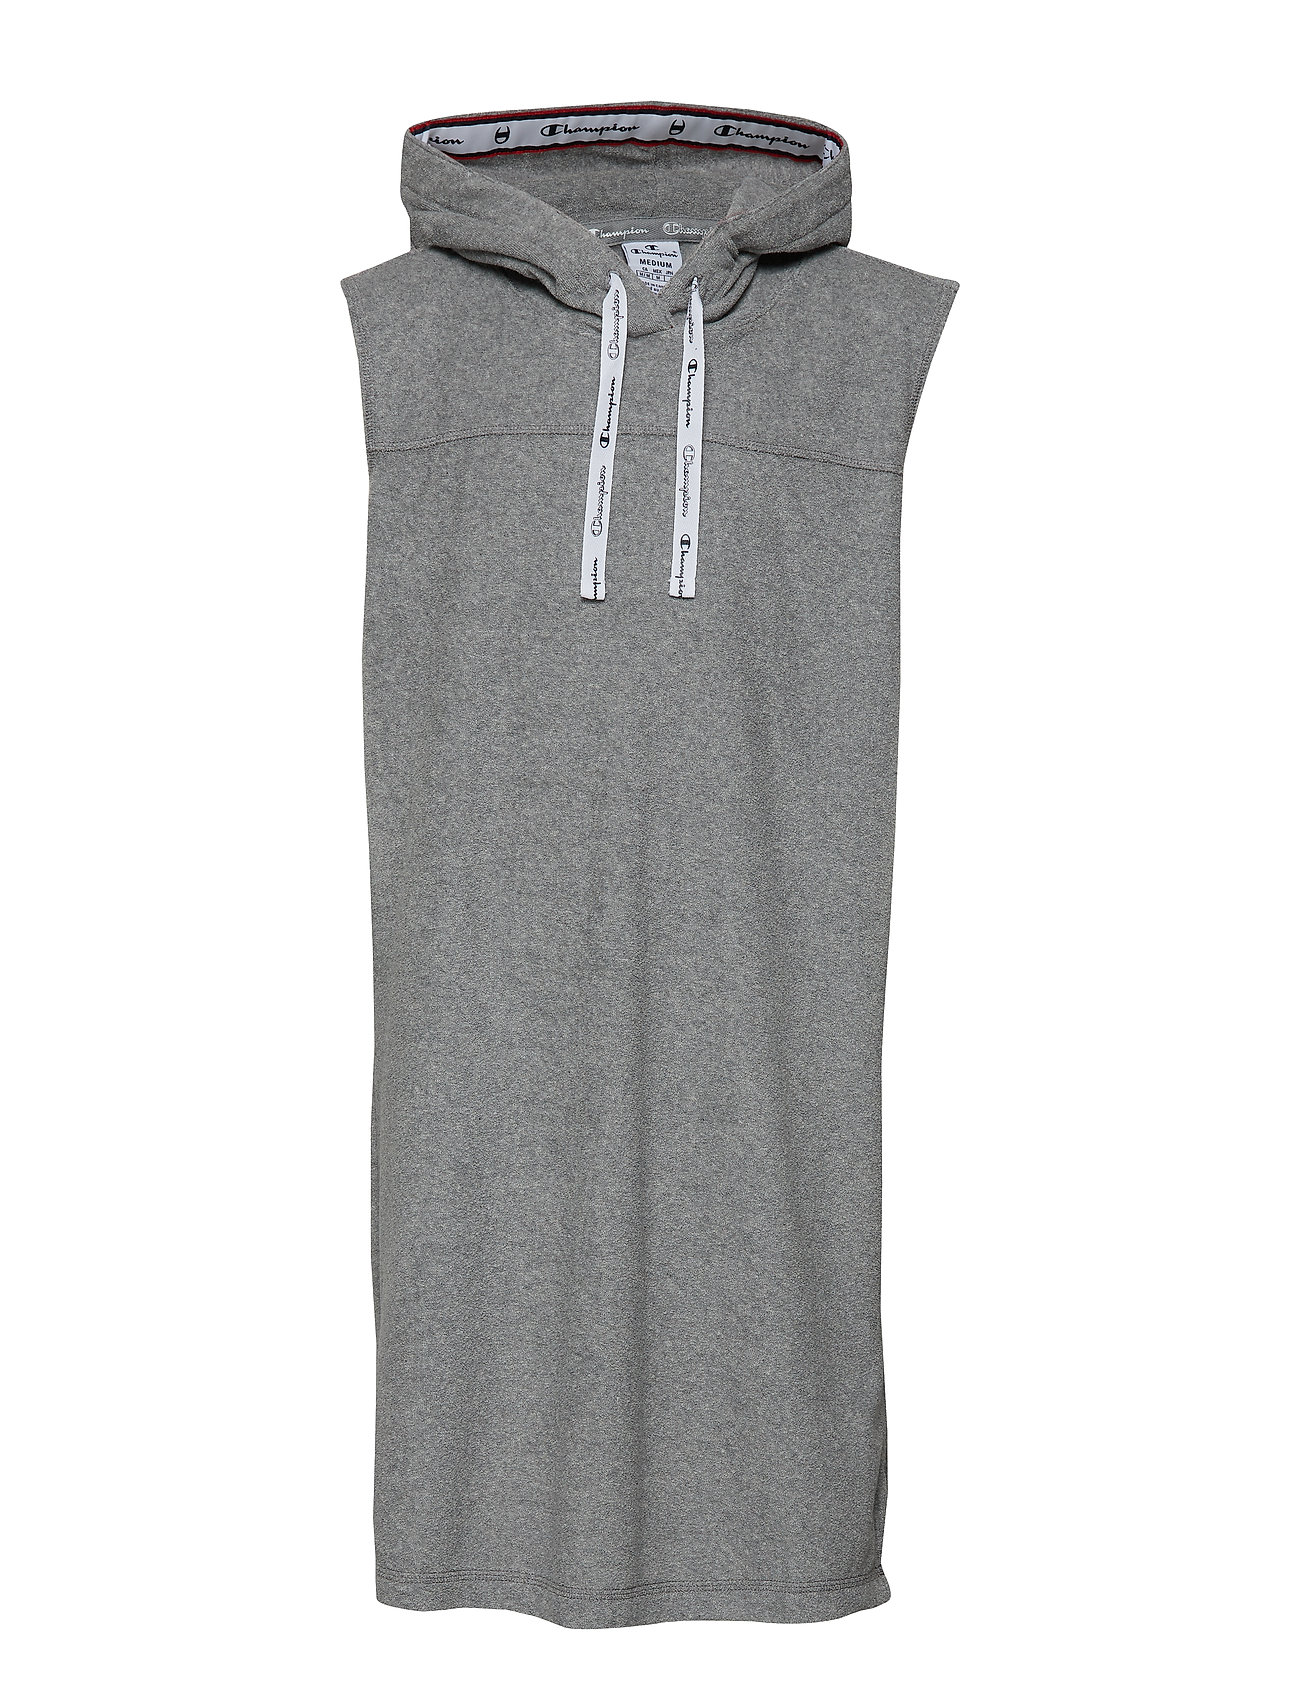 Champion Maxi Hooded Sweatshirt - GRAY MELANGE LIGHT